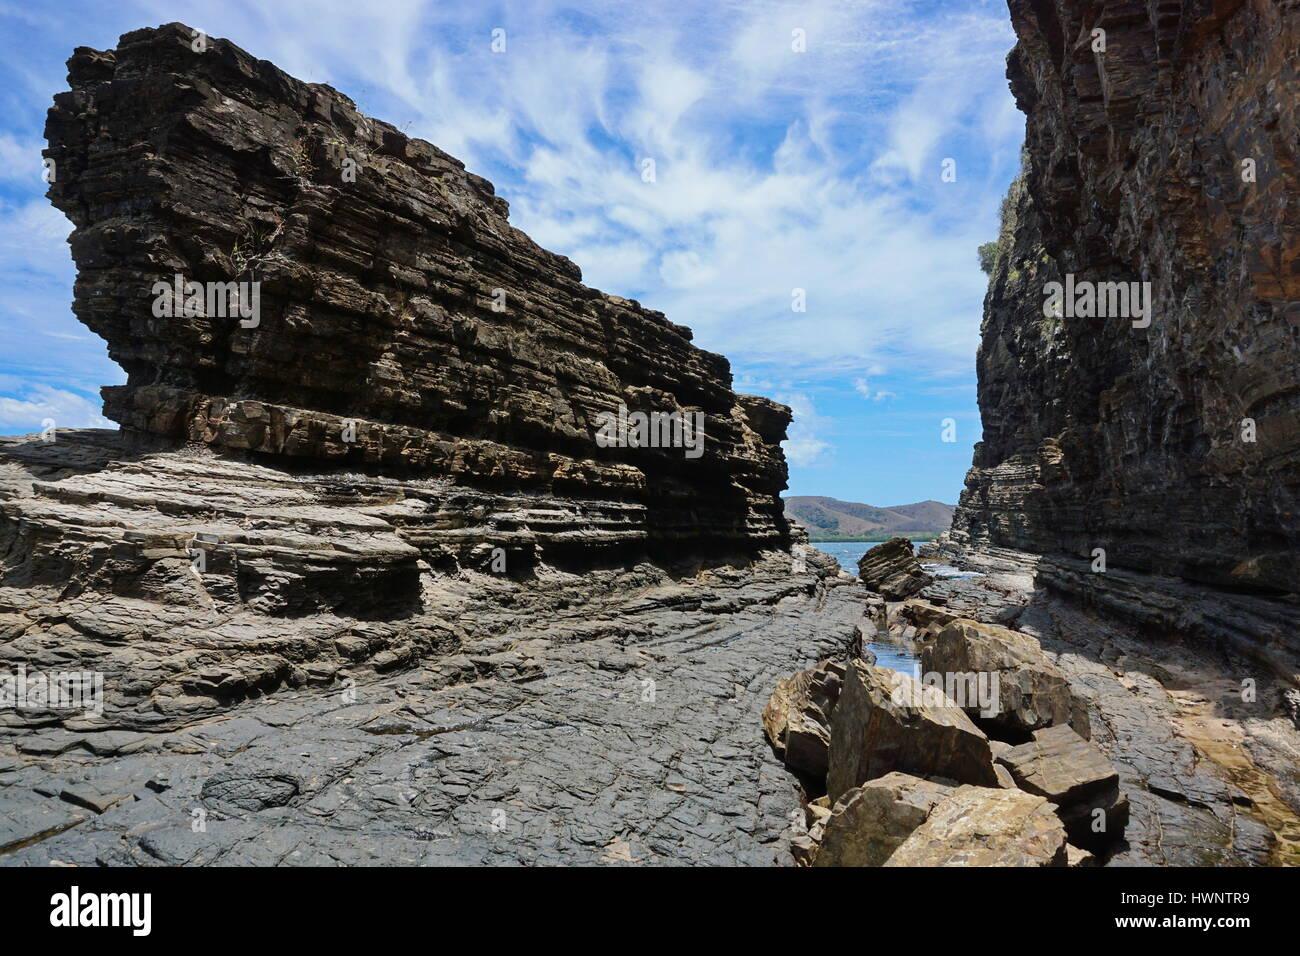 Rocky coastal landscape in New Caledonia, Bourail, Grande Terre island, south Pacific - Stock Image